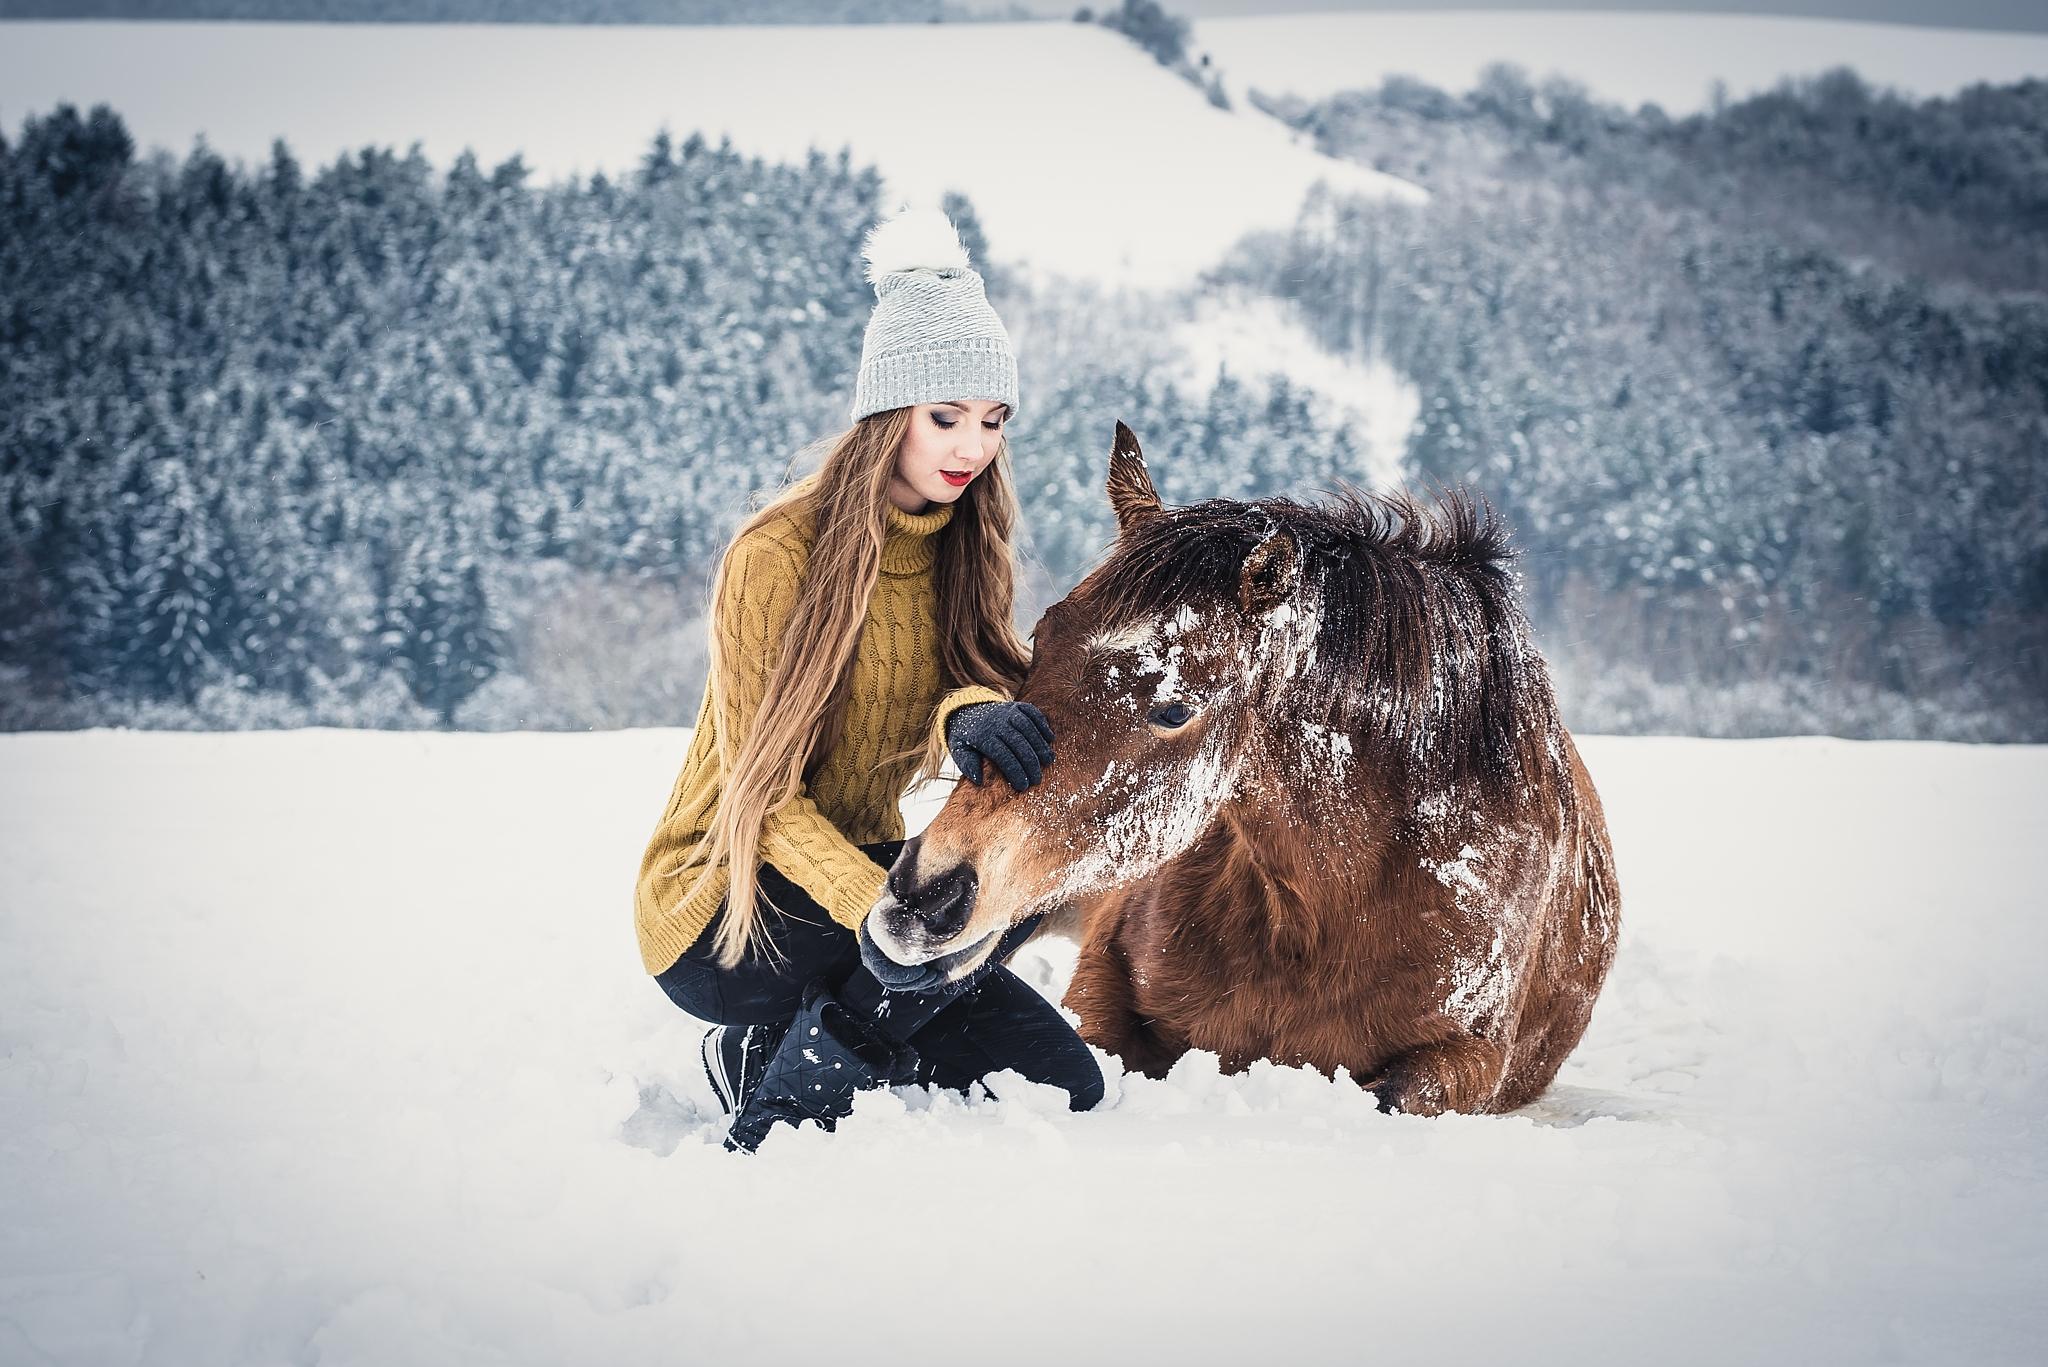 Jak fotit portrét s koněm